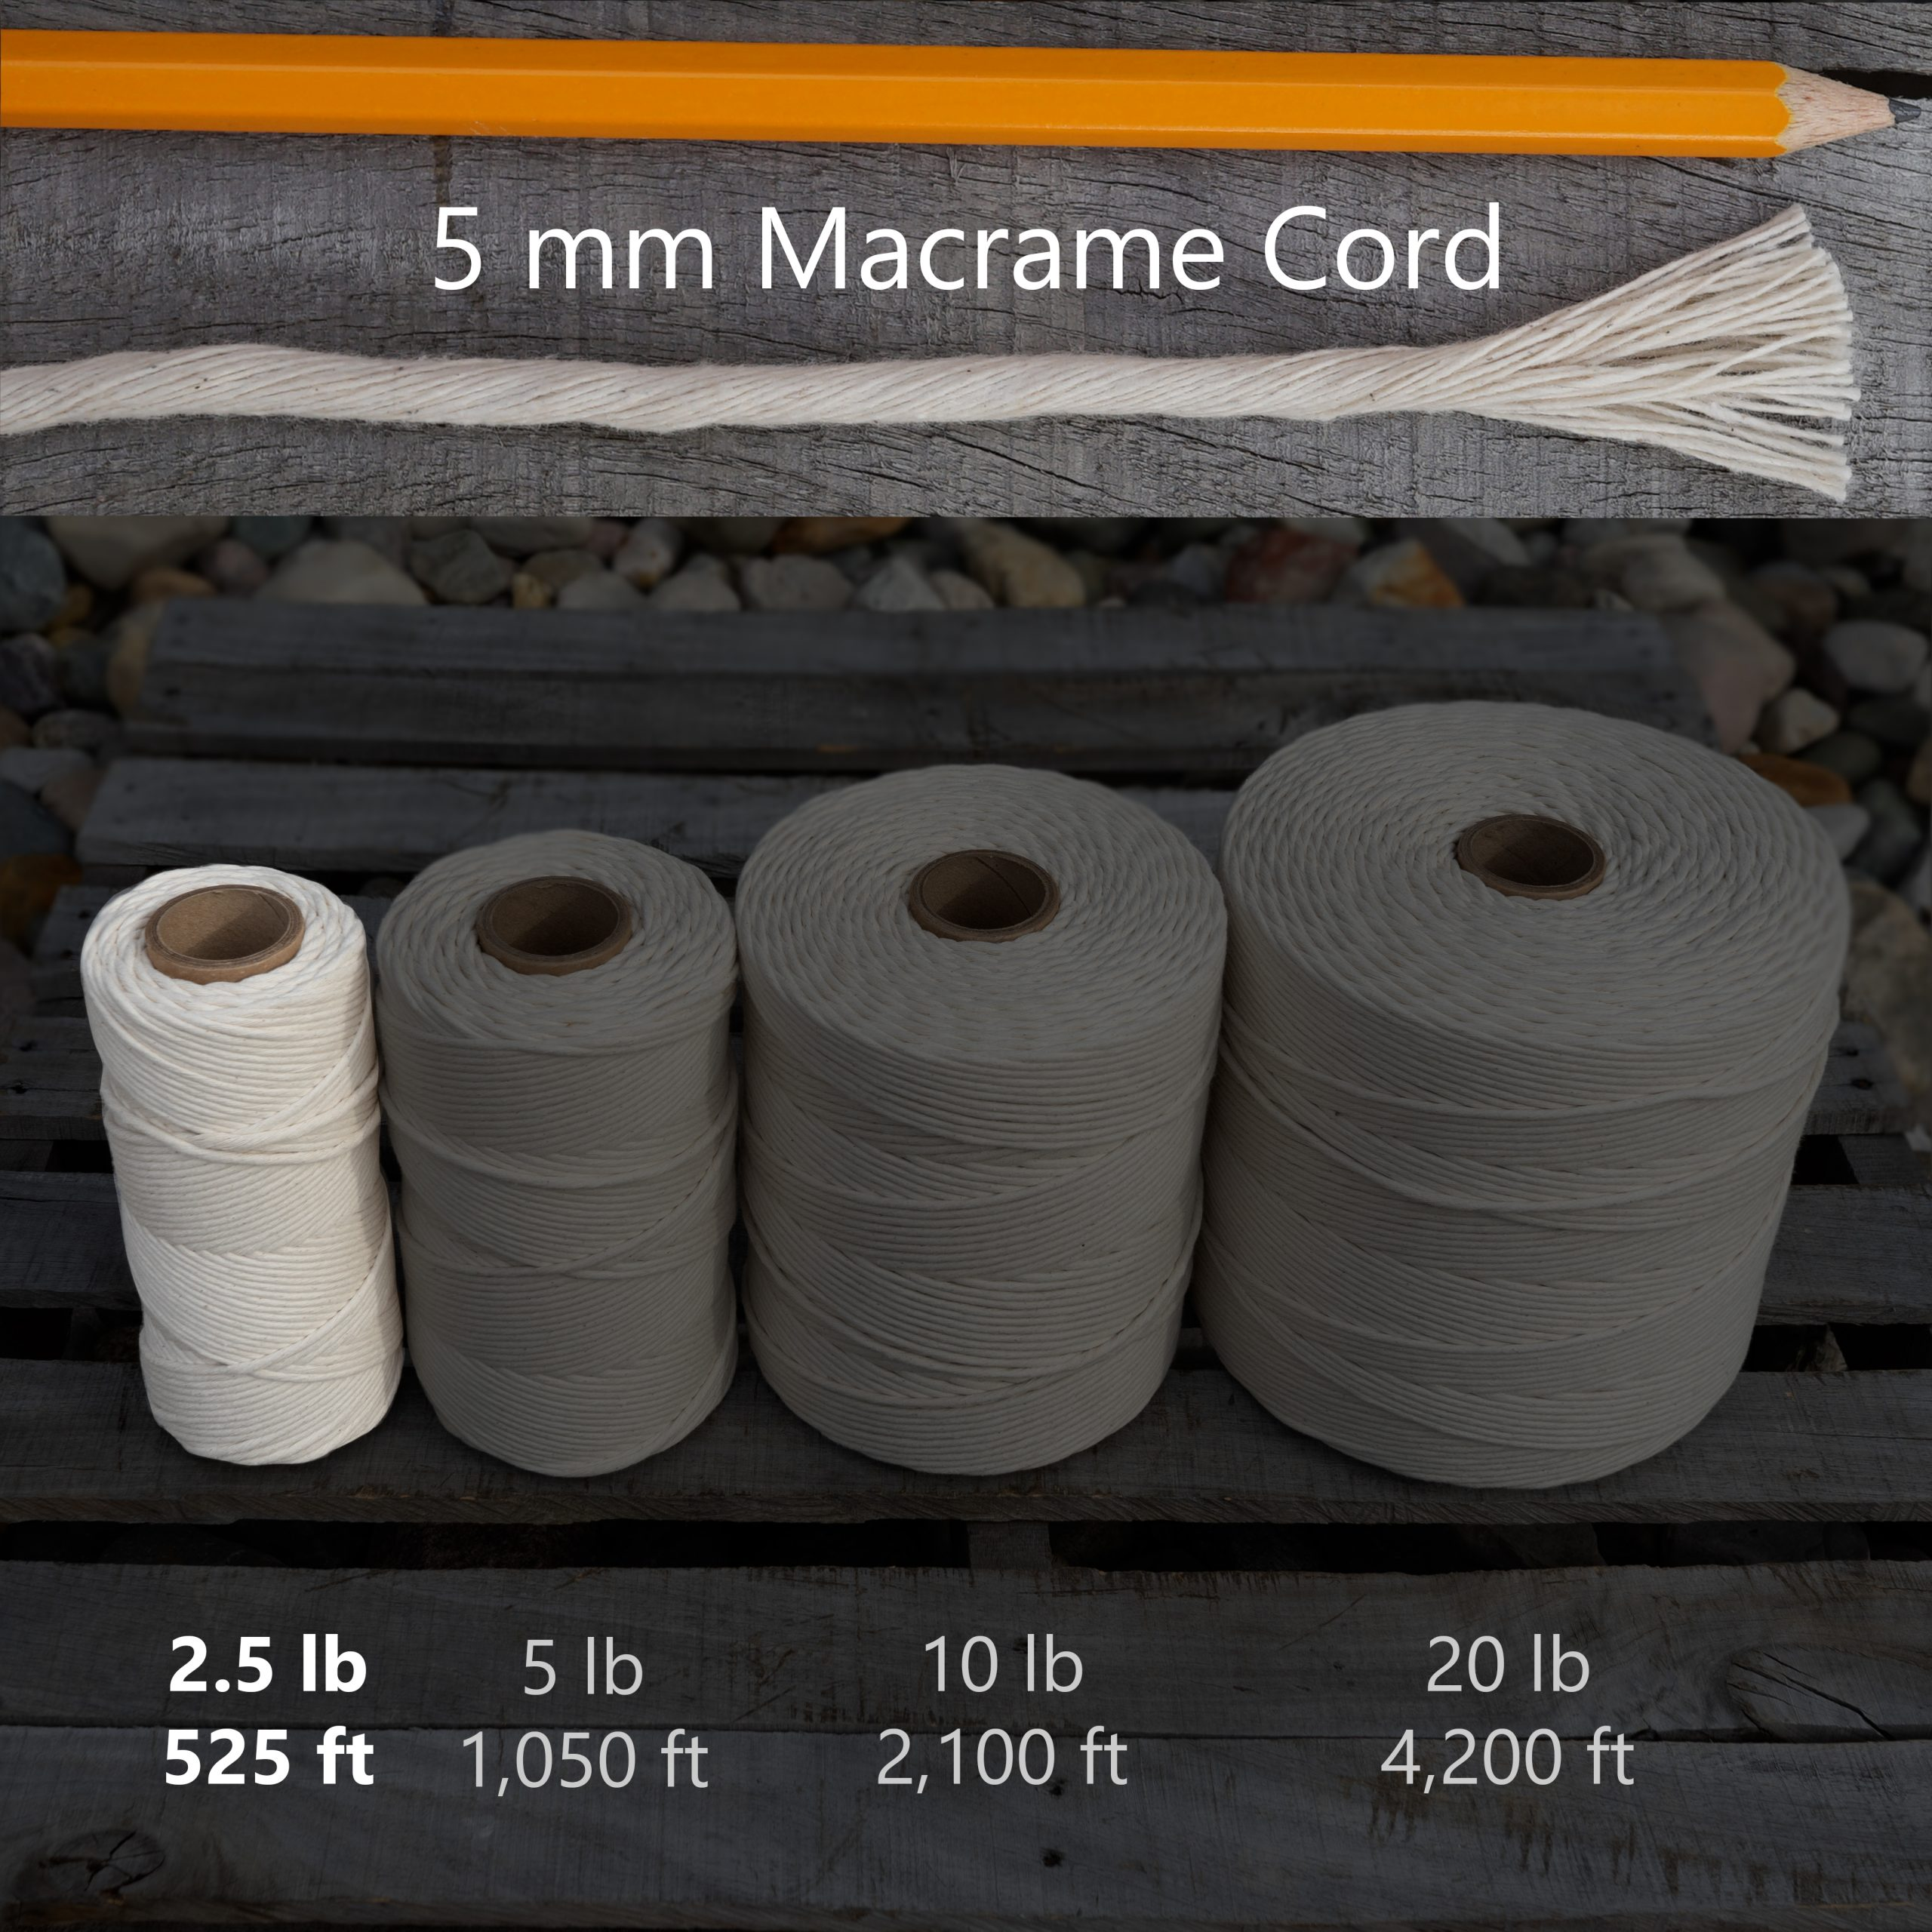 5 mm x 2.5 lb macrame tube